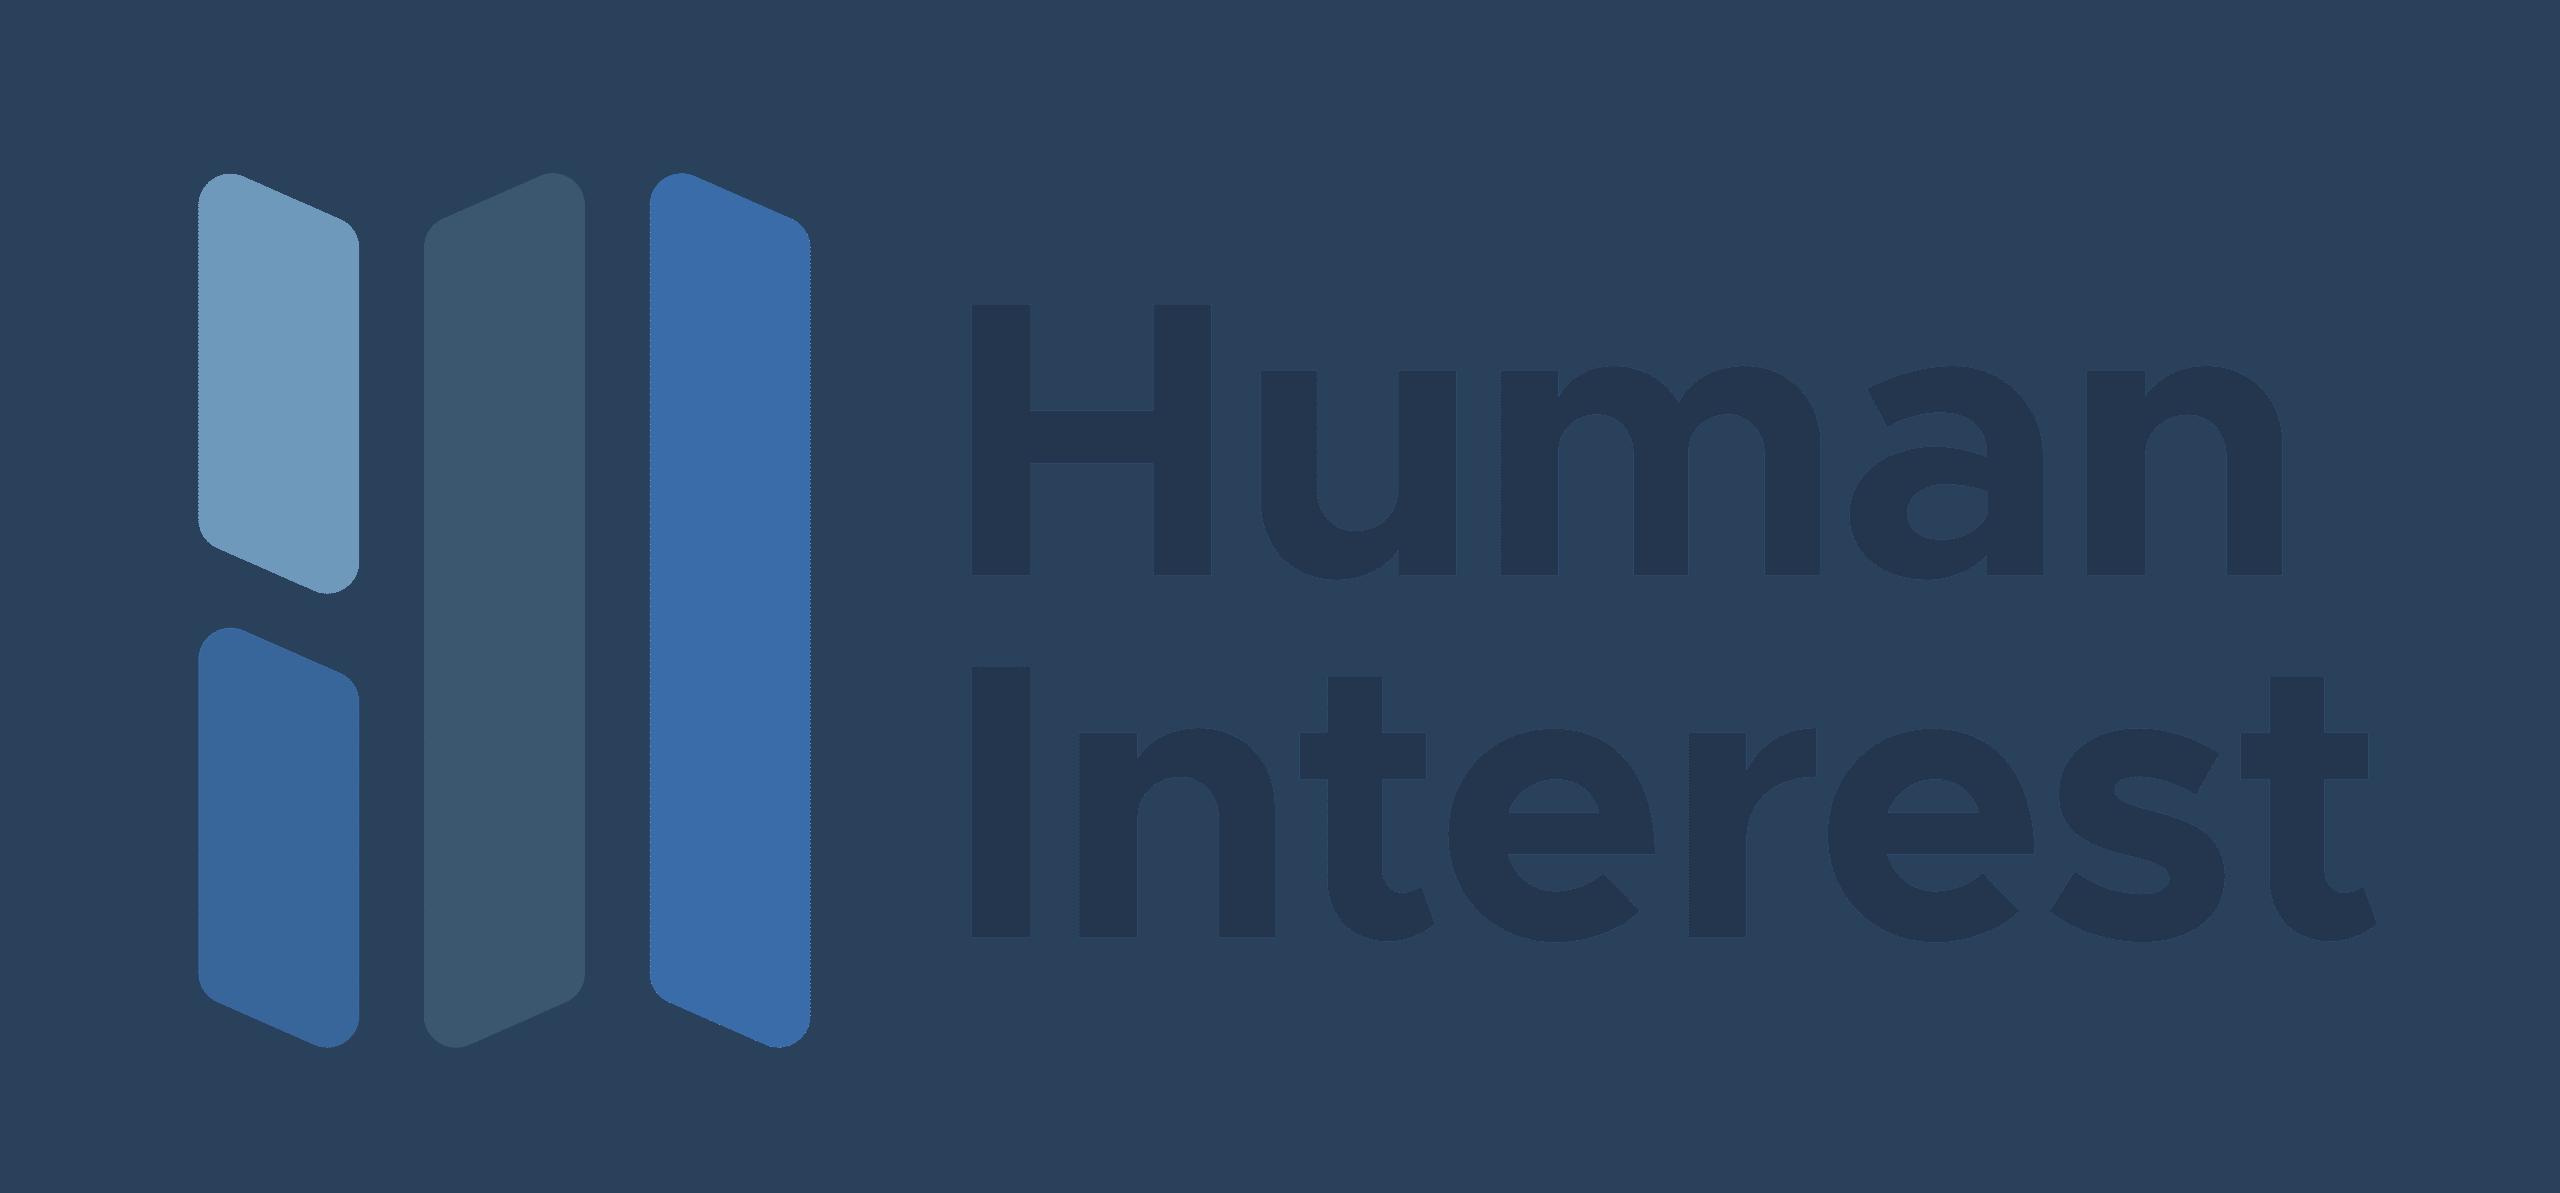 human_interest_401k